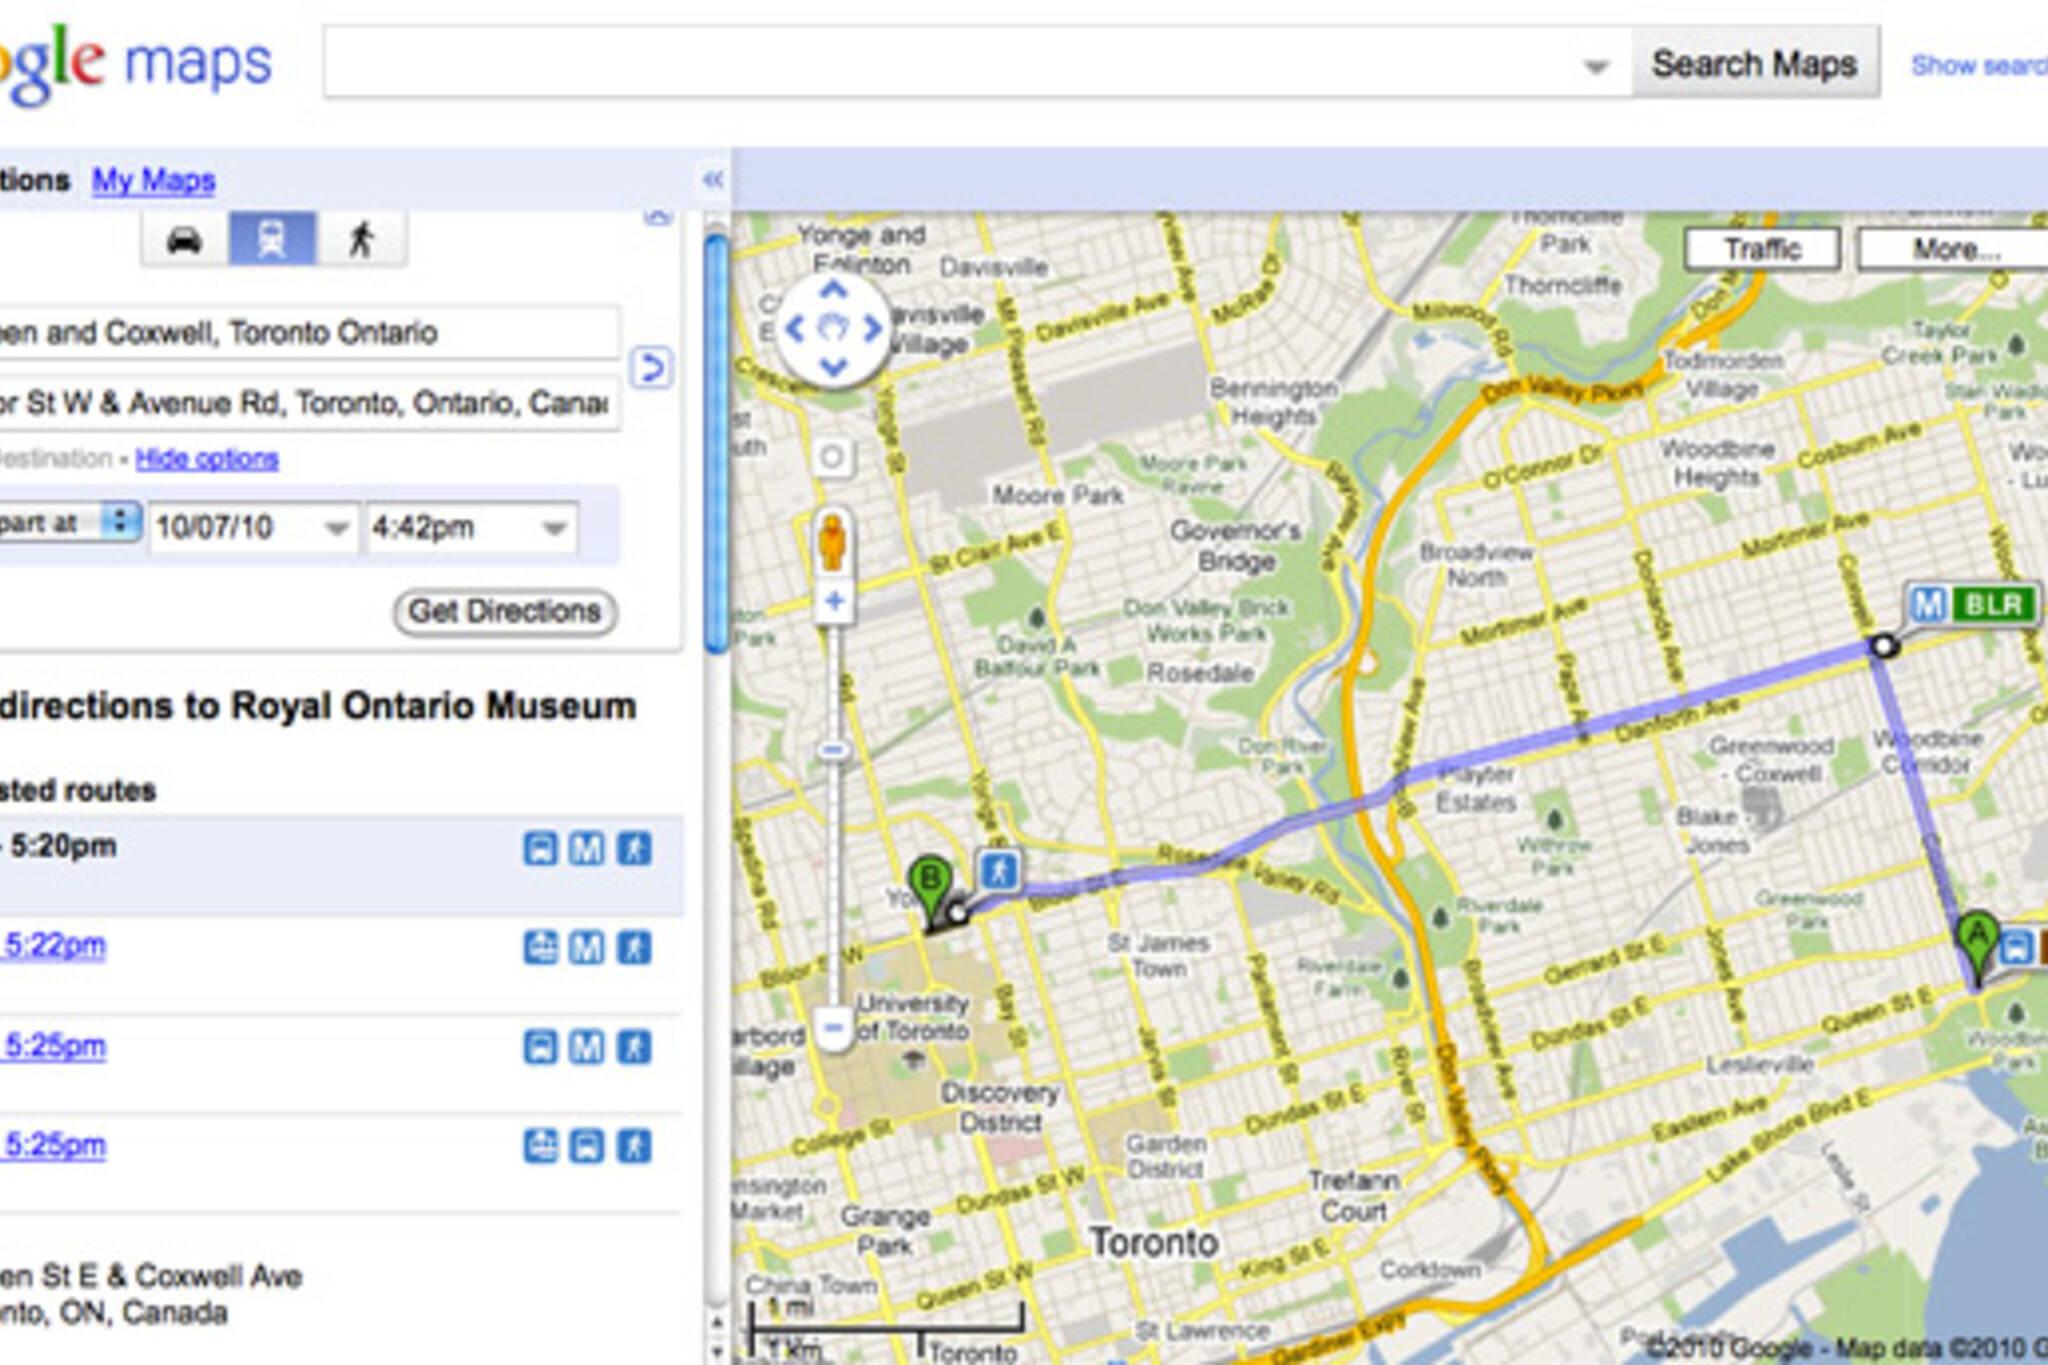 TTC Google Maps